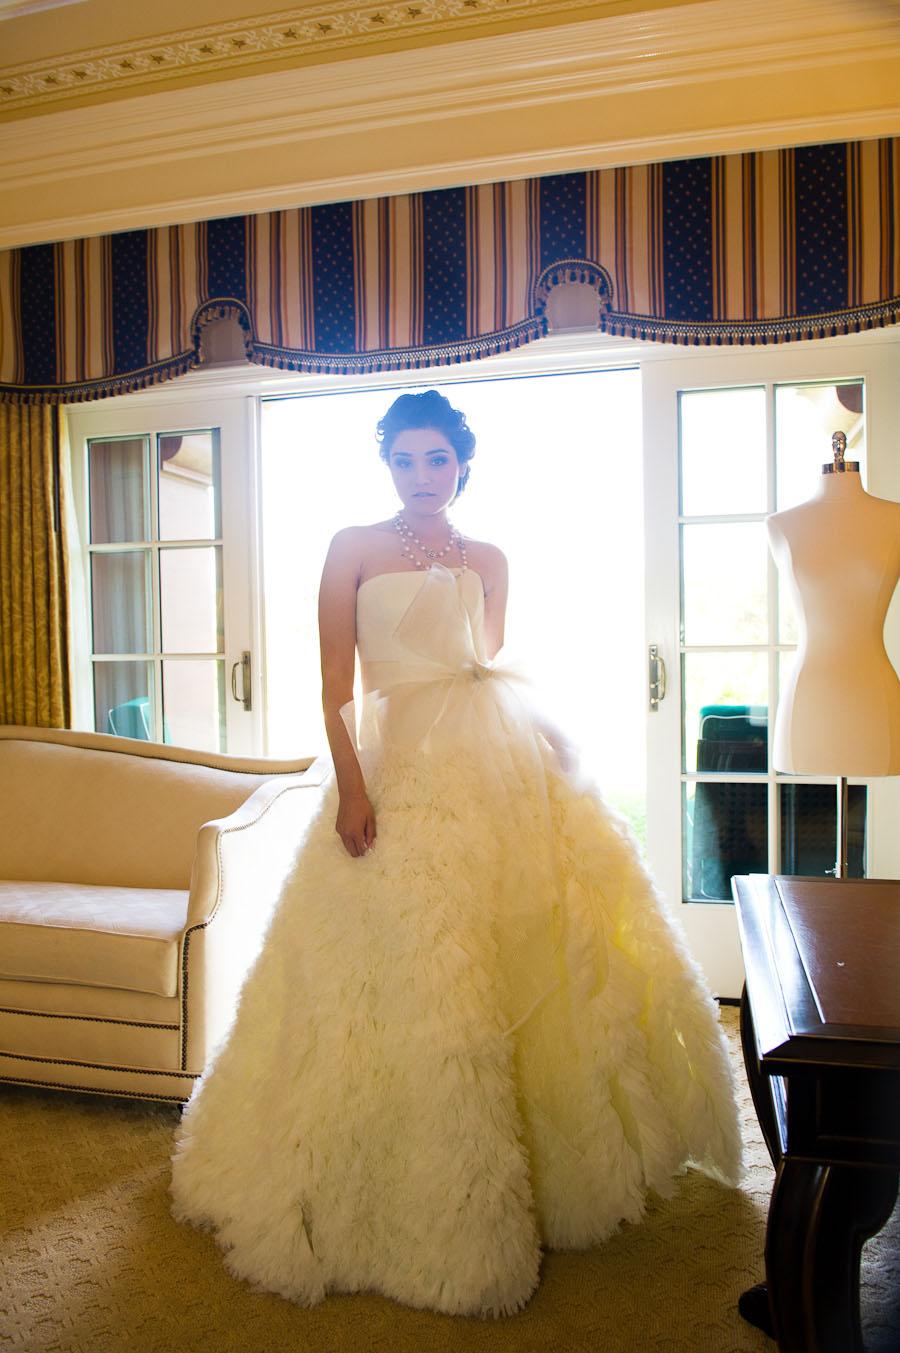 stewart_bertrand_weddings_whp1-1023.jpg